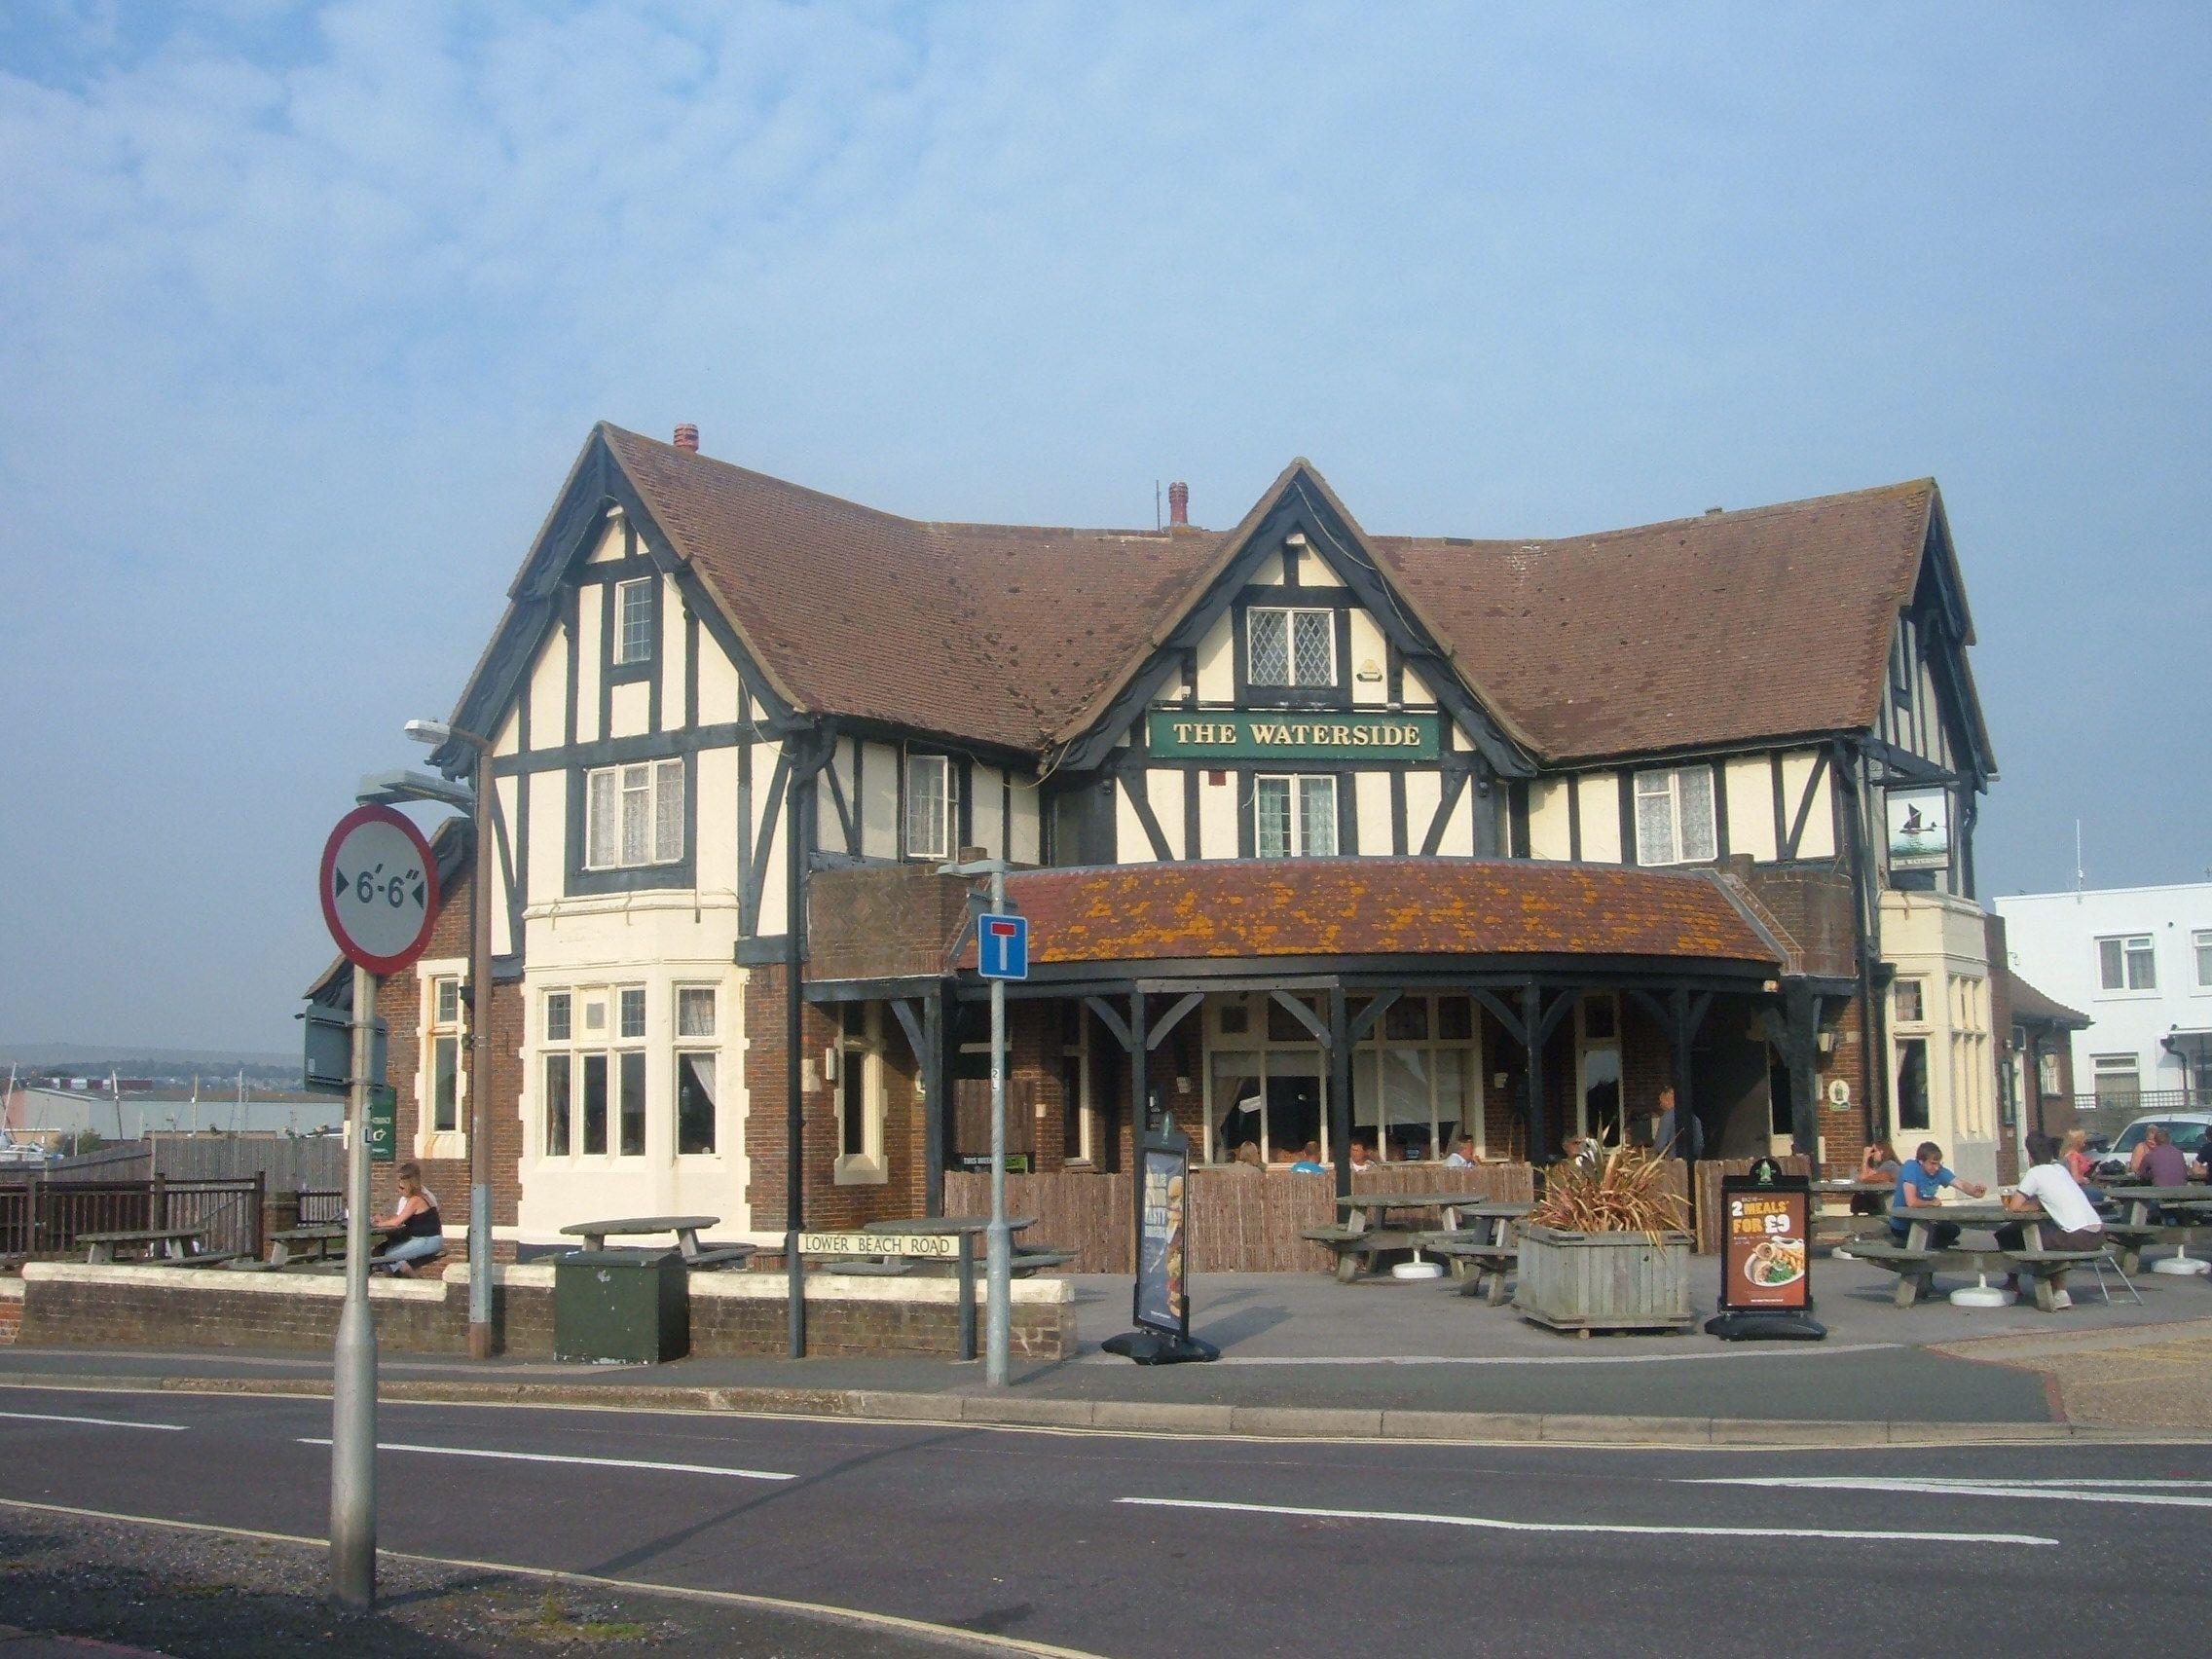 11.The Waterside, Shroreham-by-Sea. option 2, Janet Cameron